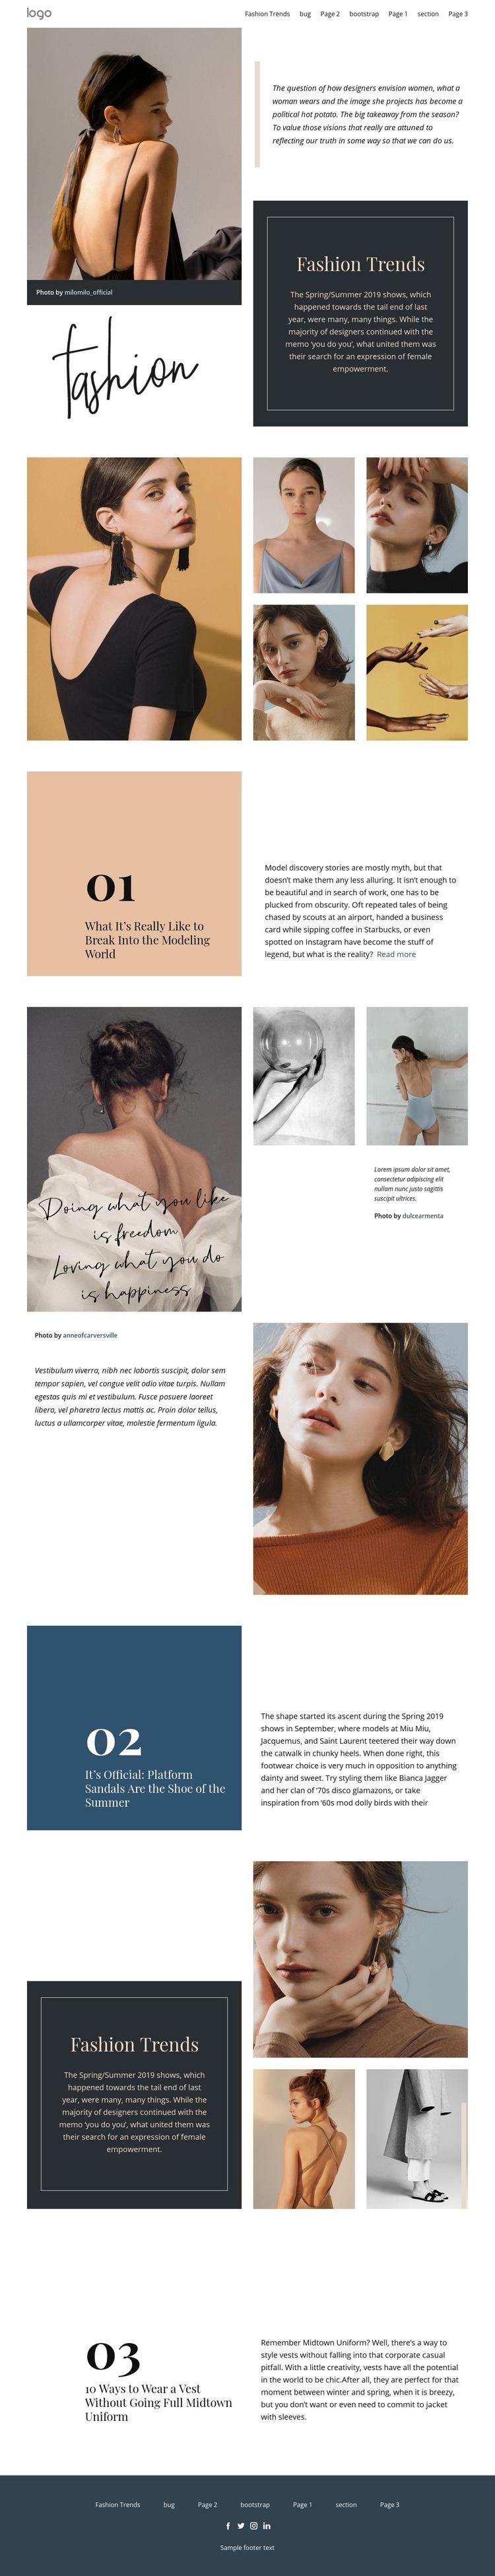 Designer vision of fashion Html Code Example